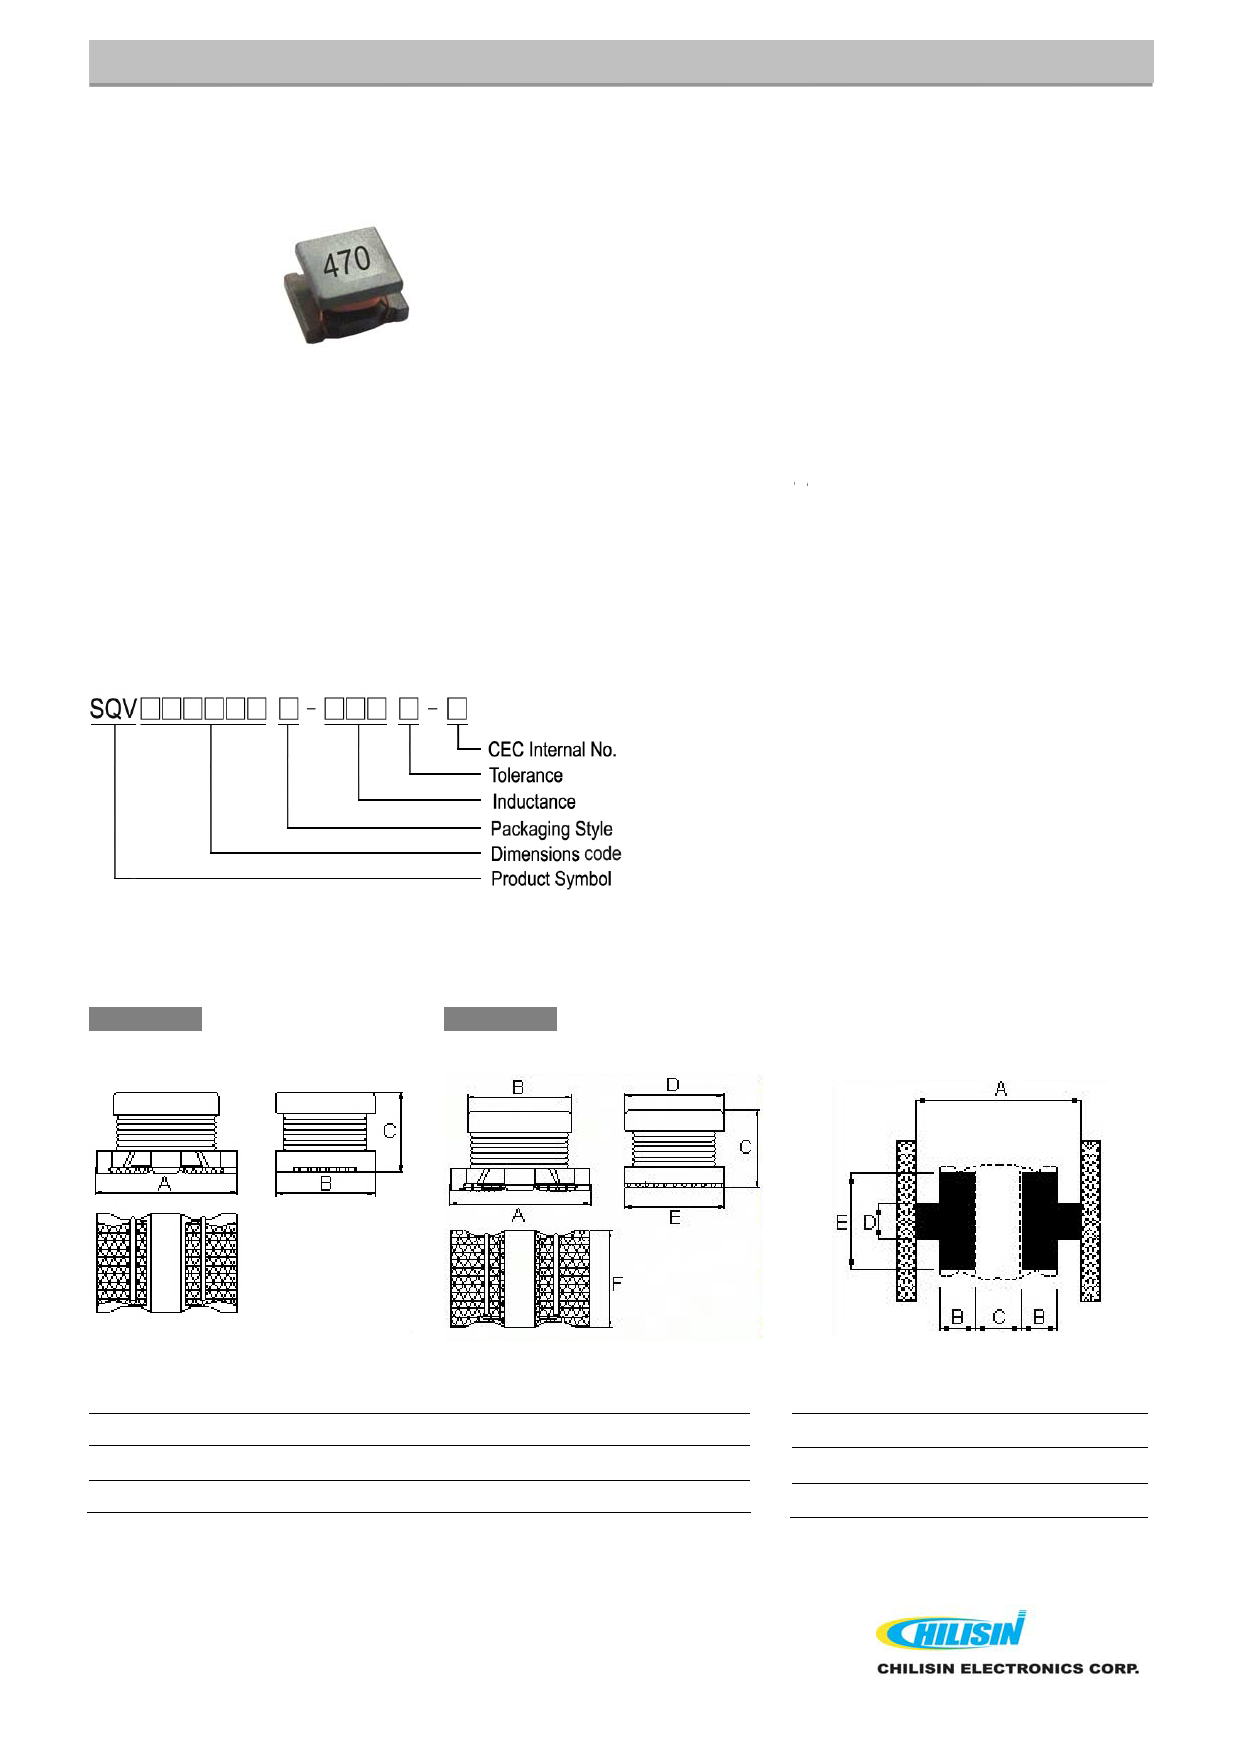 SQV322520 데이터시트 및 SQV322520 PDF